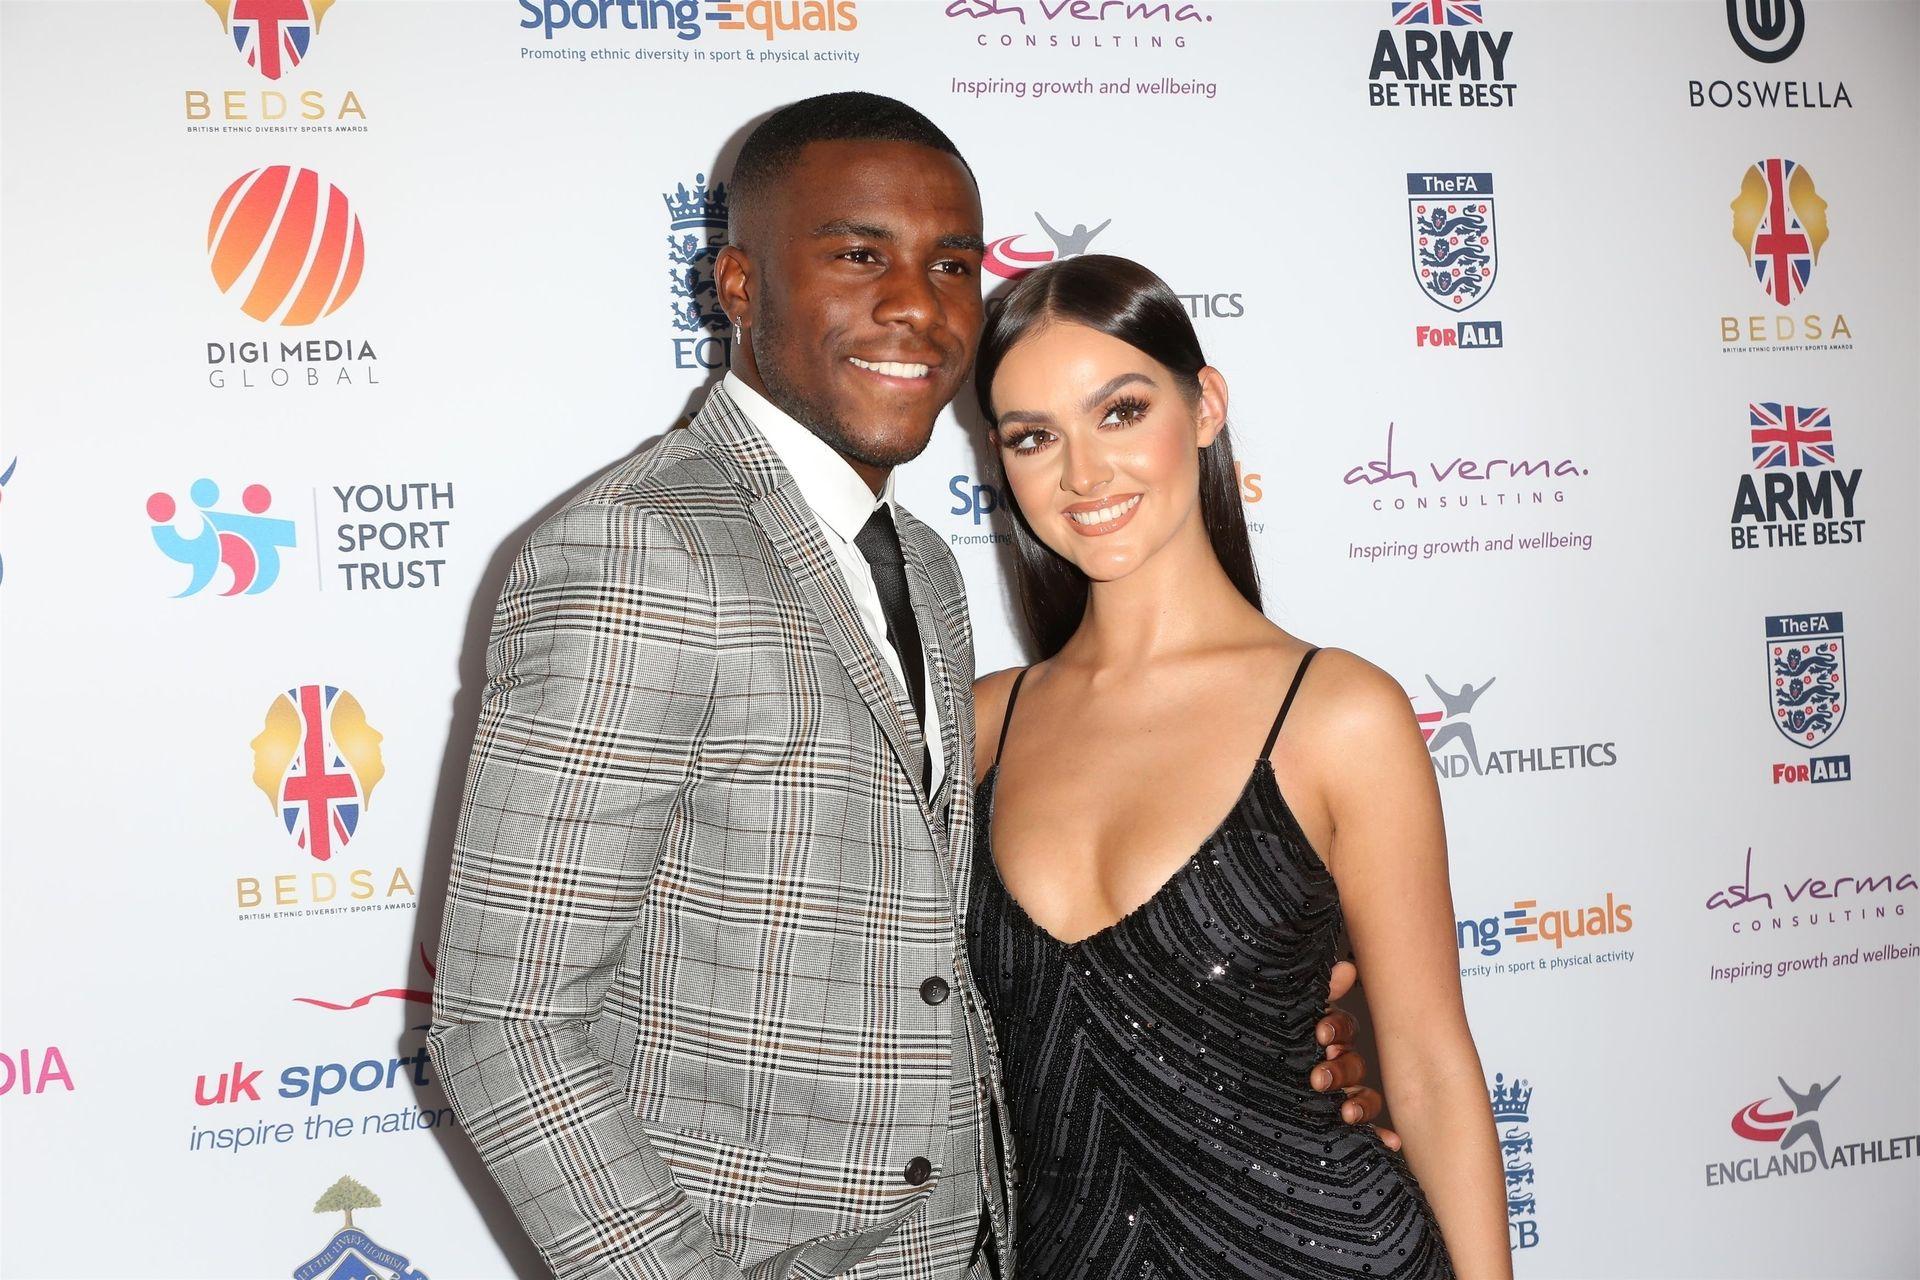 Siannise Fudge & Luke Trotman Are Seen At British Ethnic Diversity Sports Awards 0042